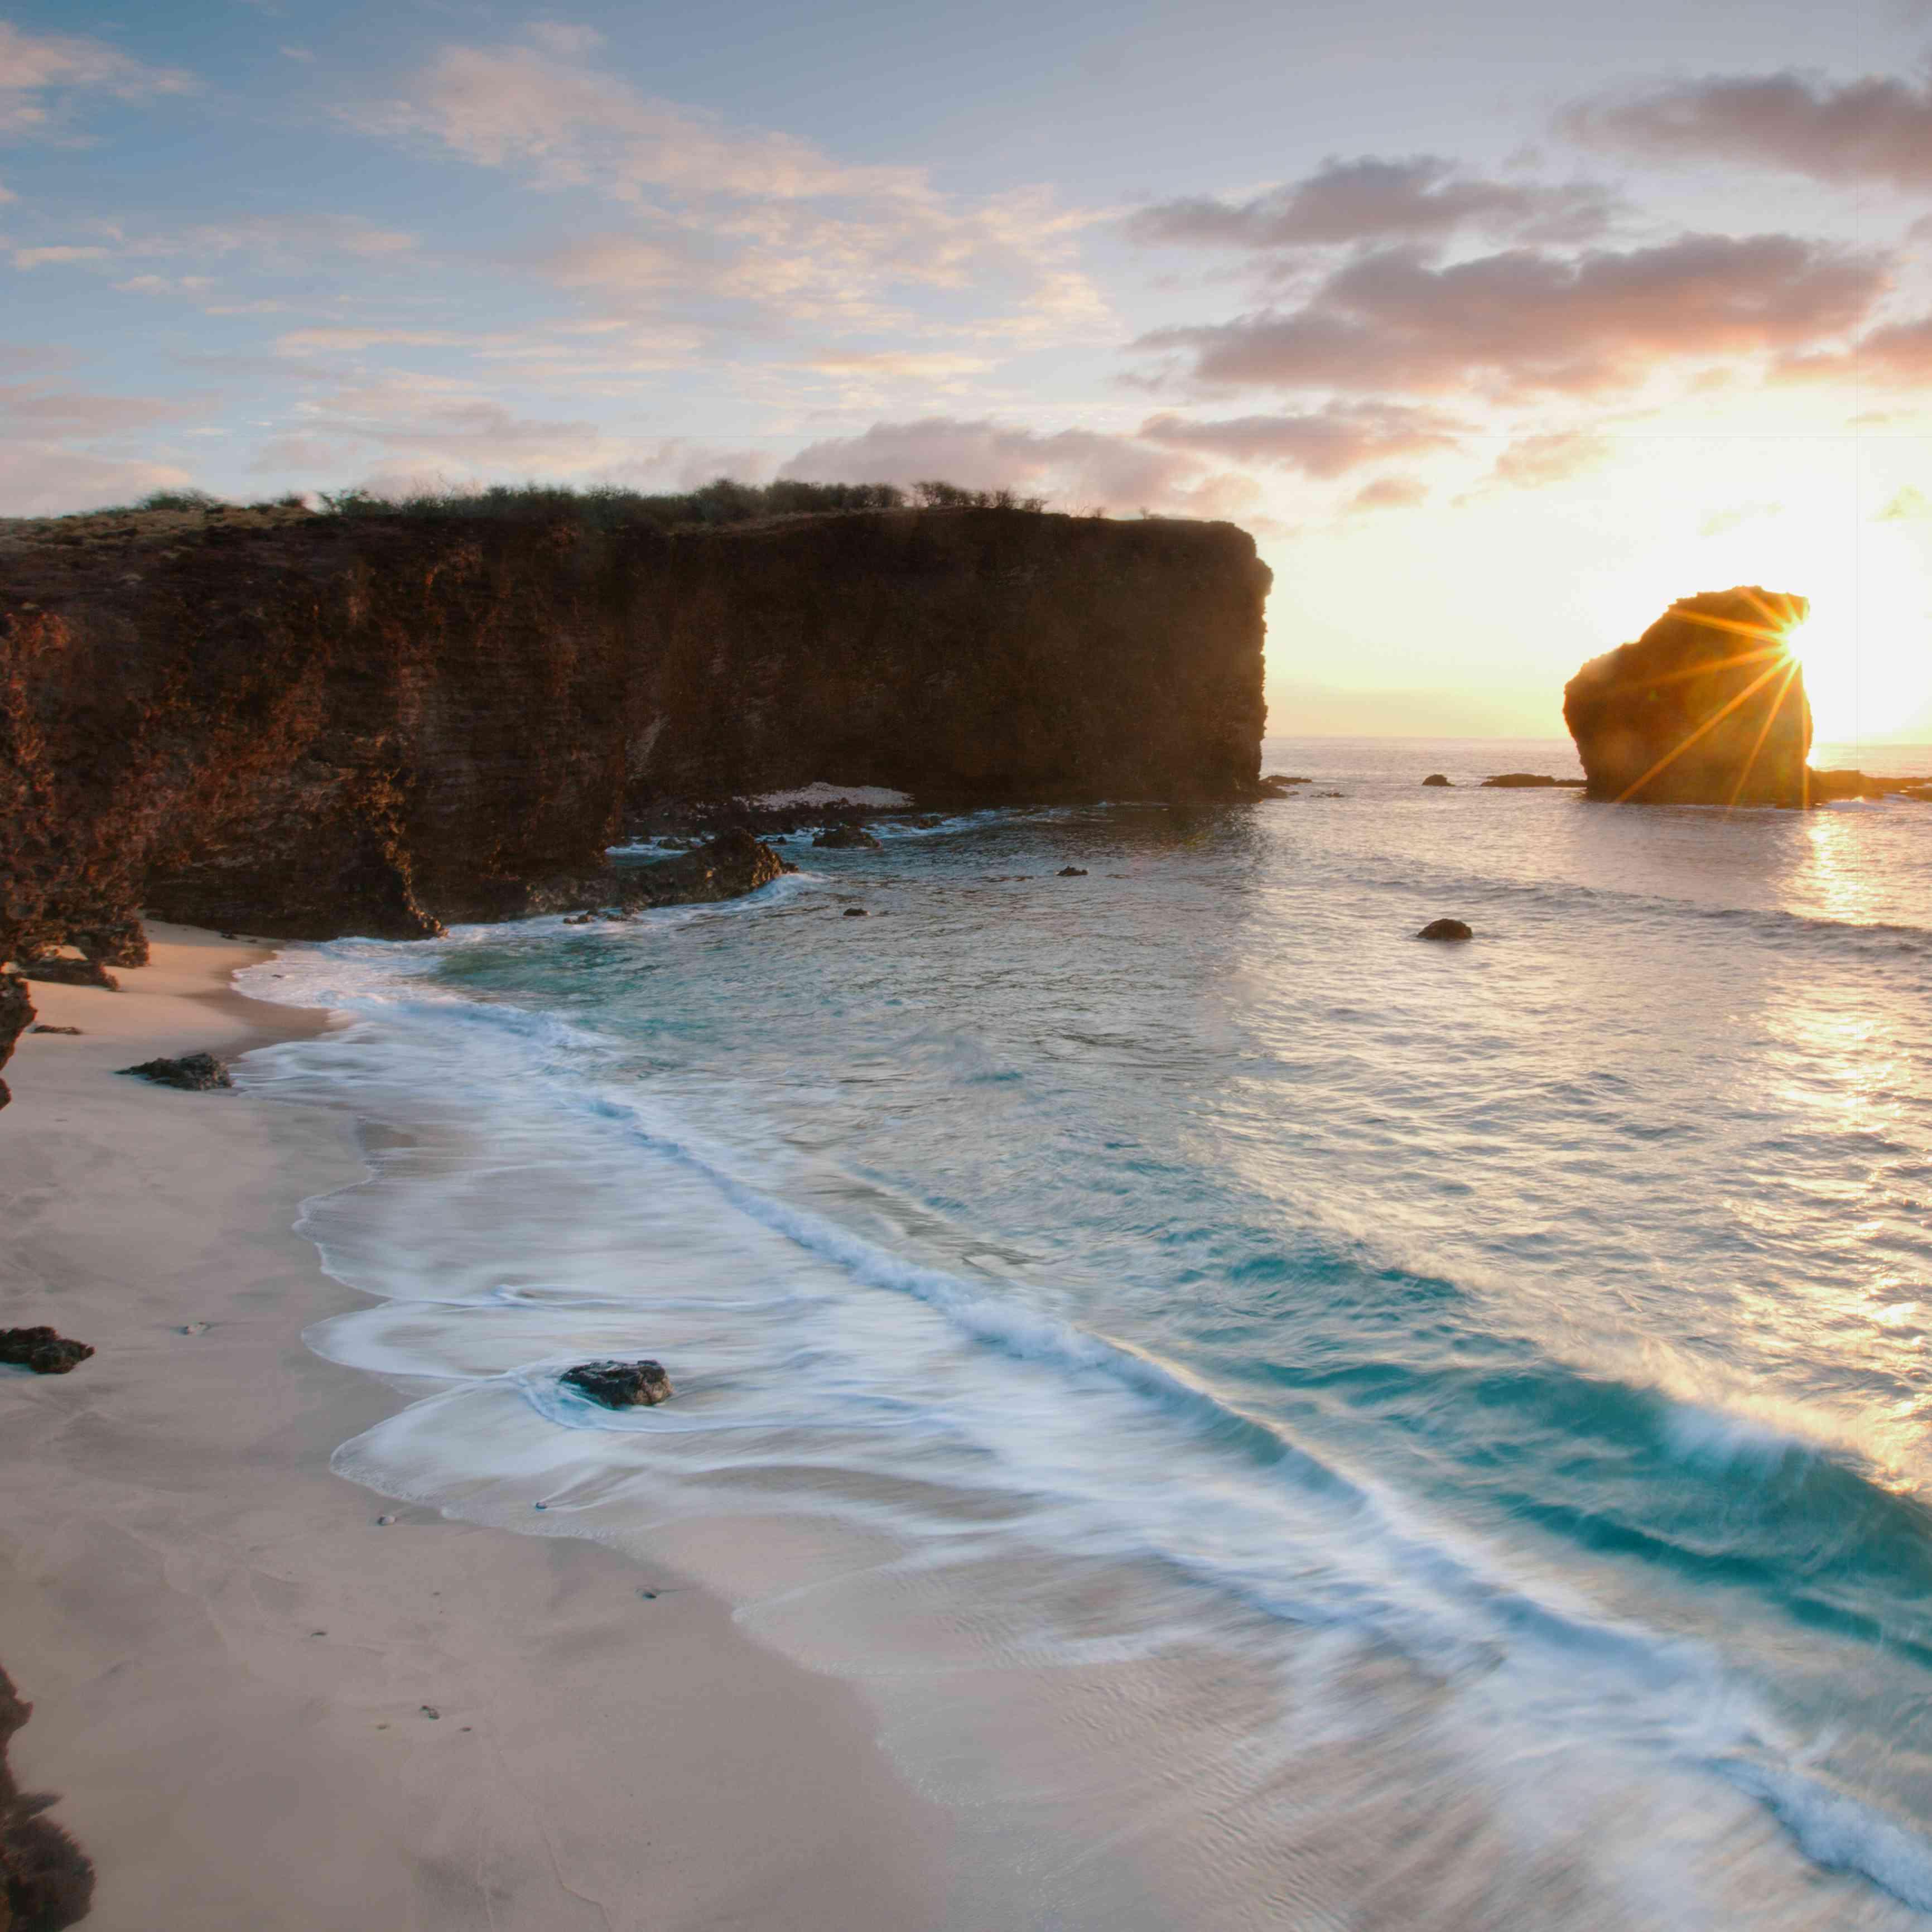 The Top 100 Honeymoon Destinations for 2019